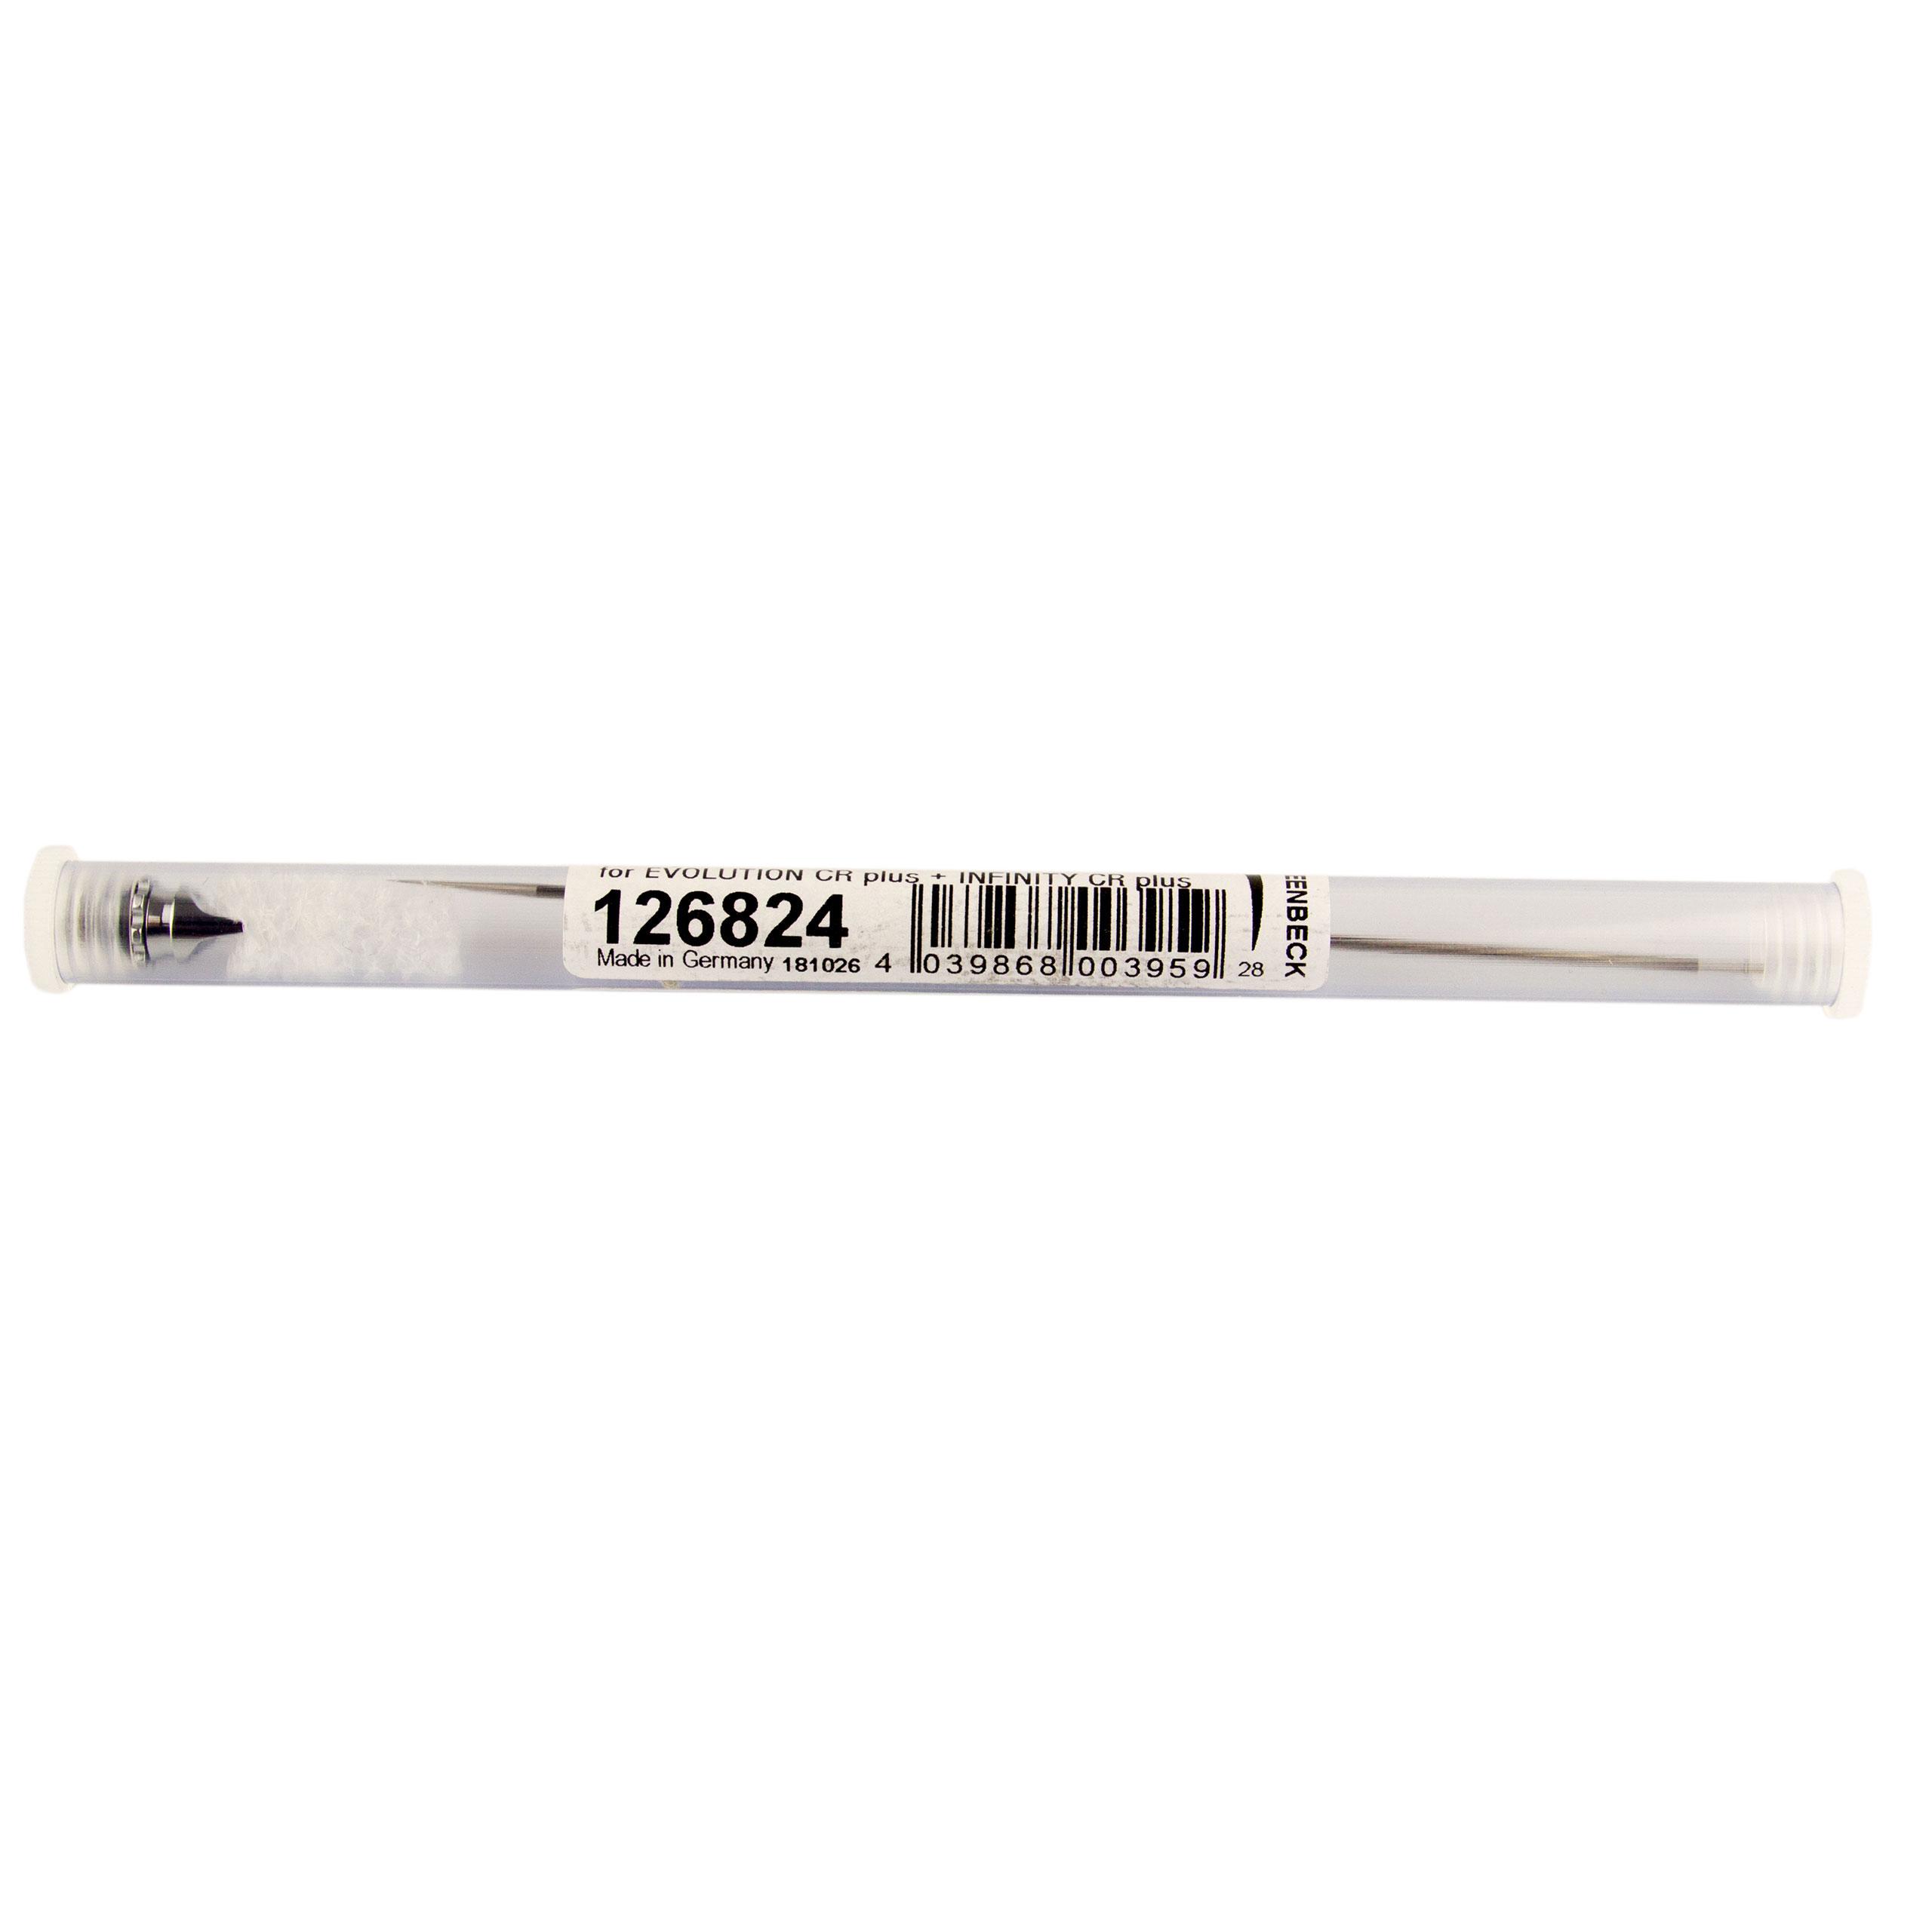 Düsensatz 0,15mm 126824 für CR plus fine line, Chrom